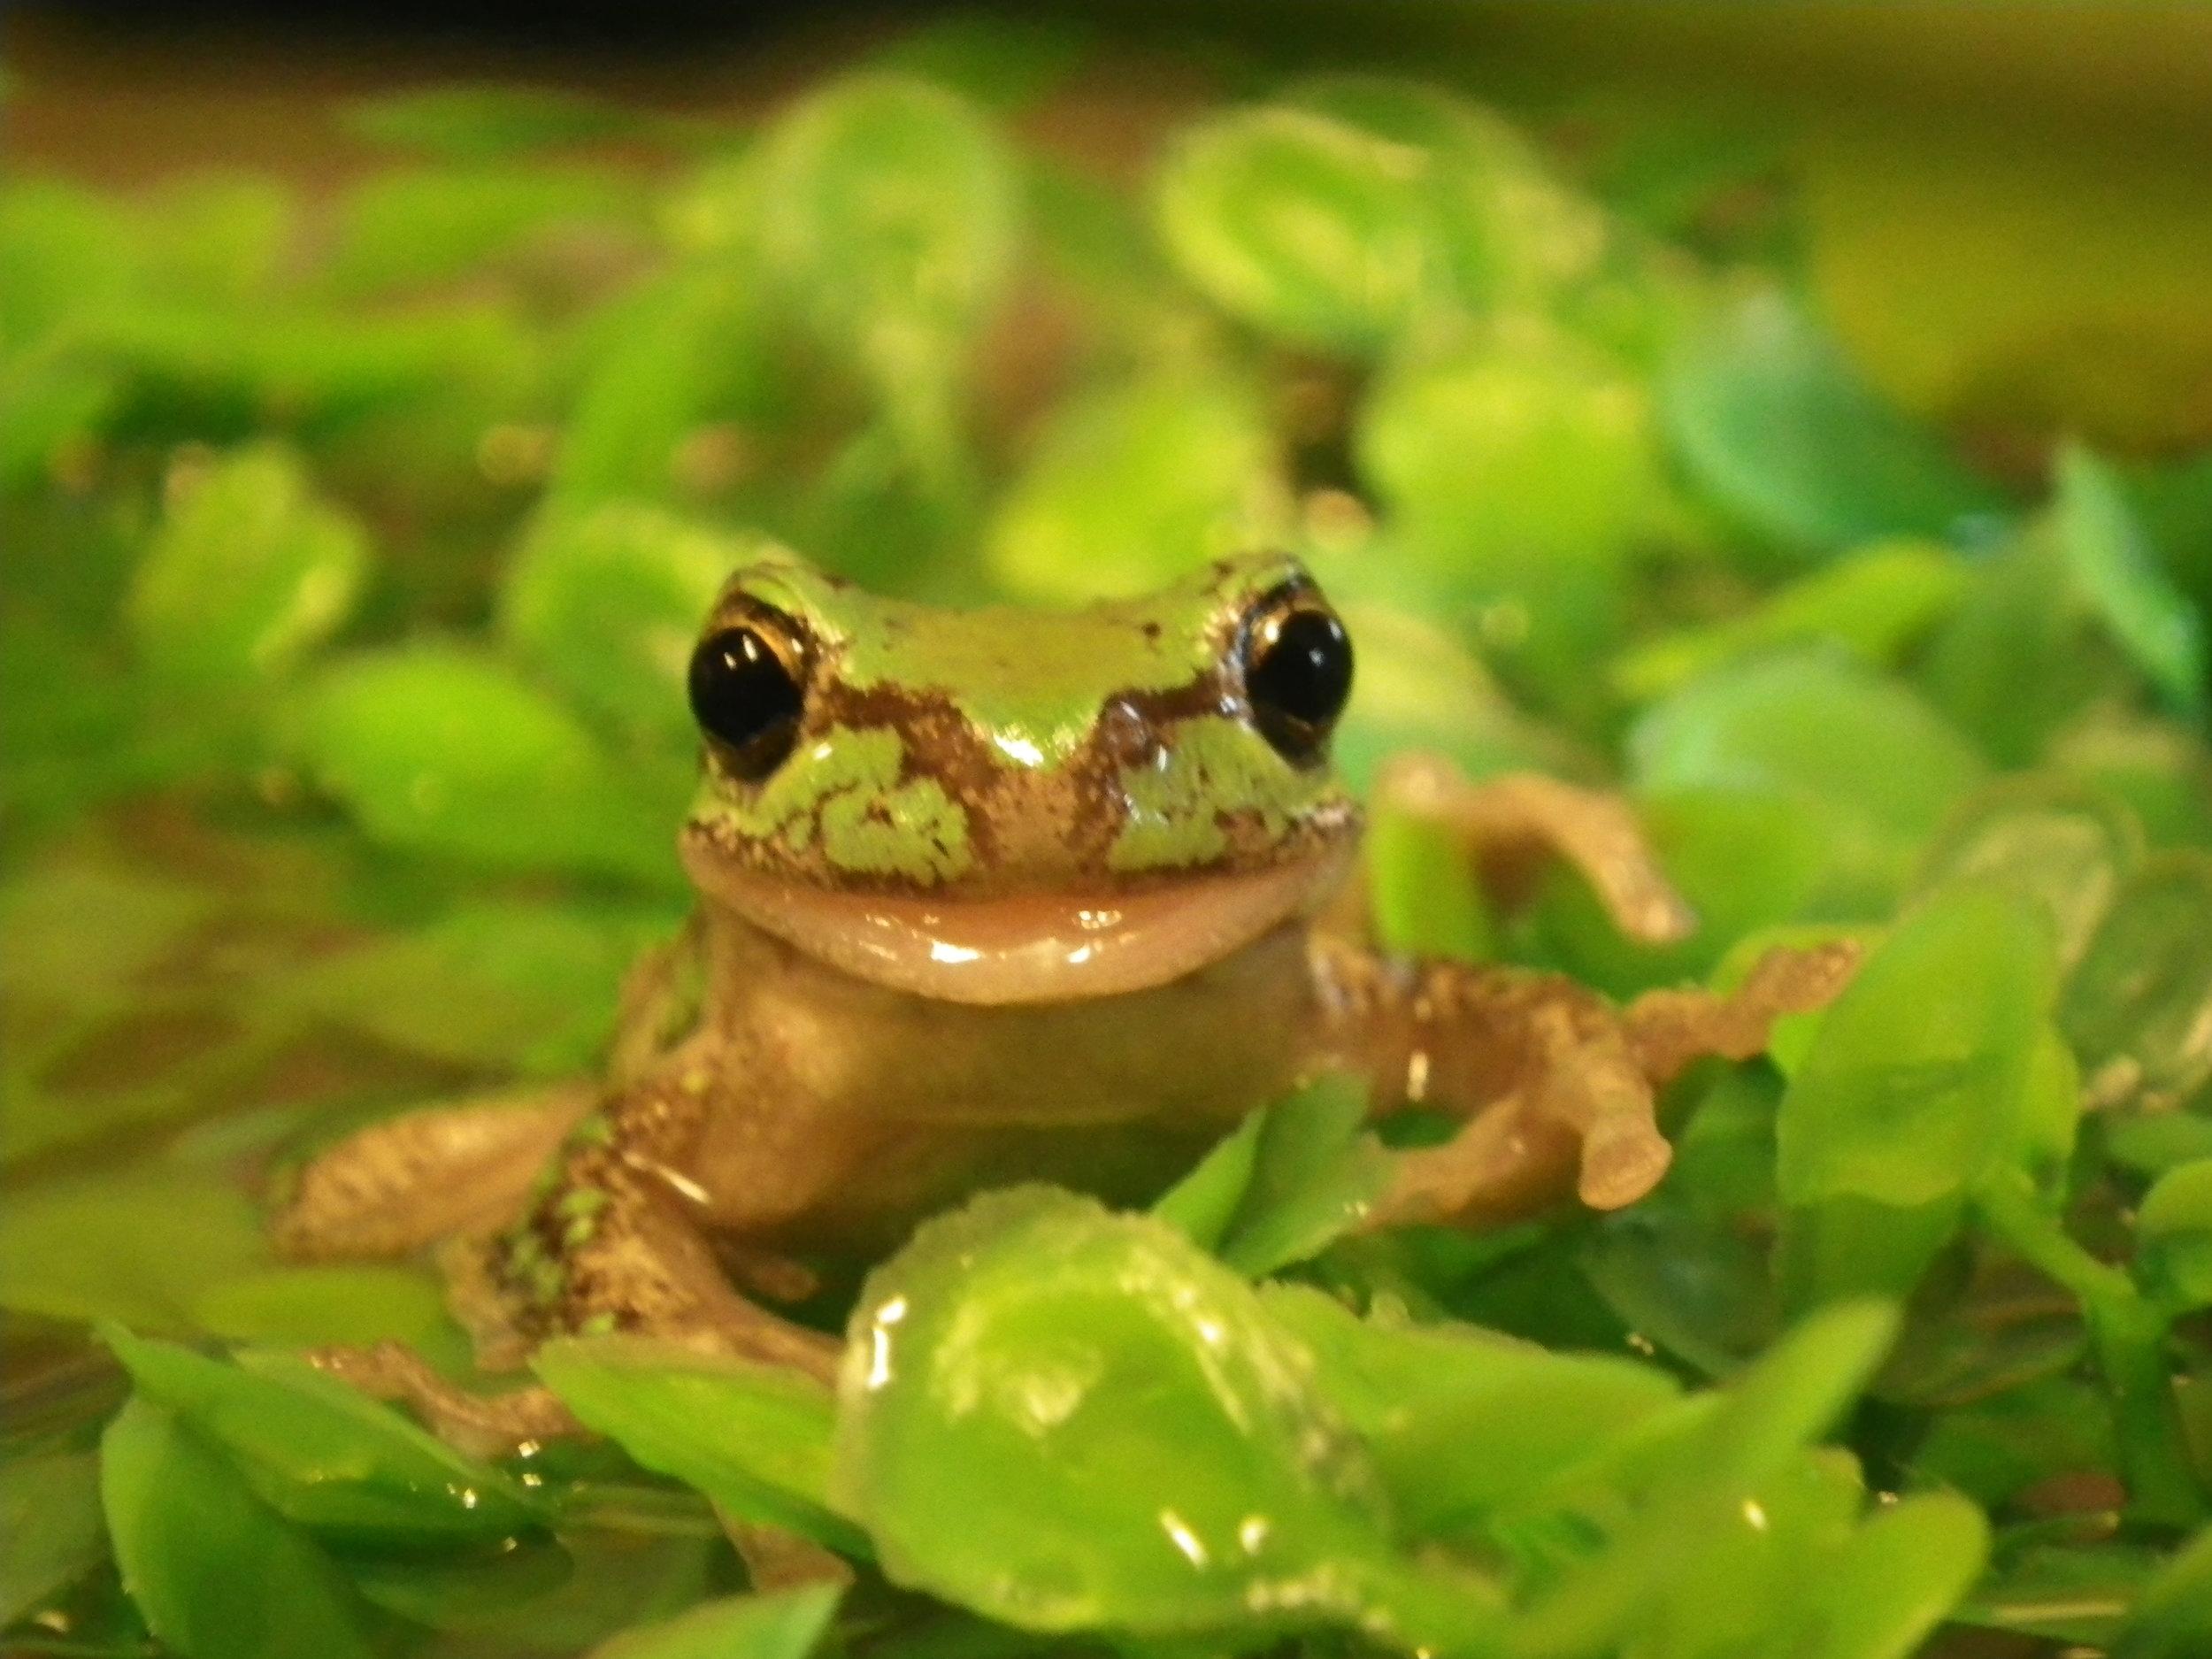 Freddo, one of our Tasmanian Tree Frogs.